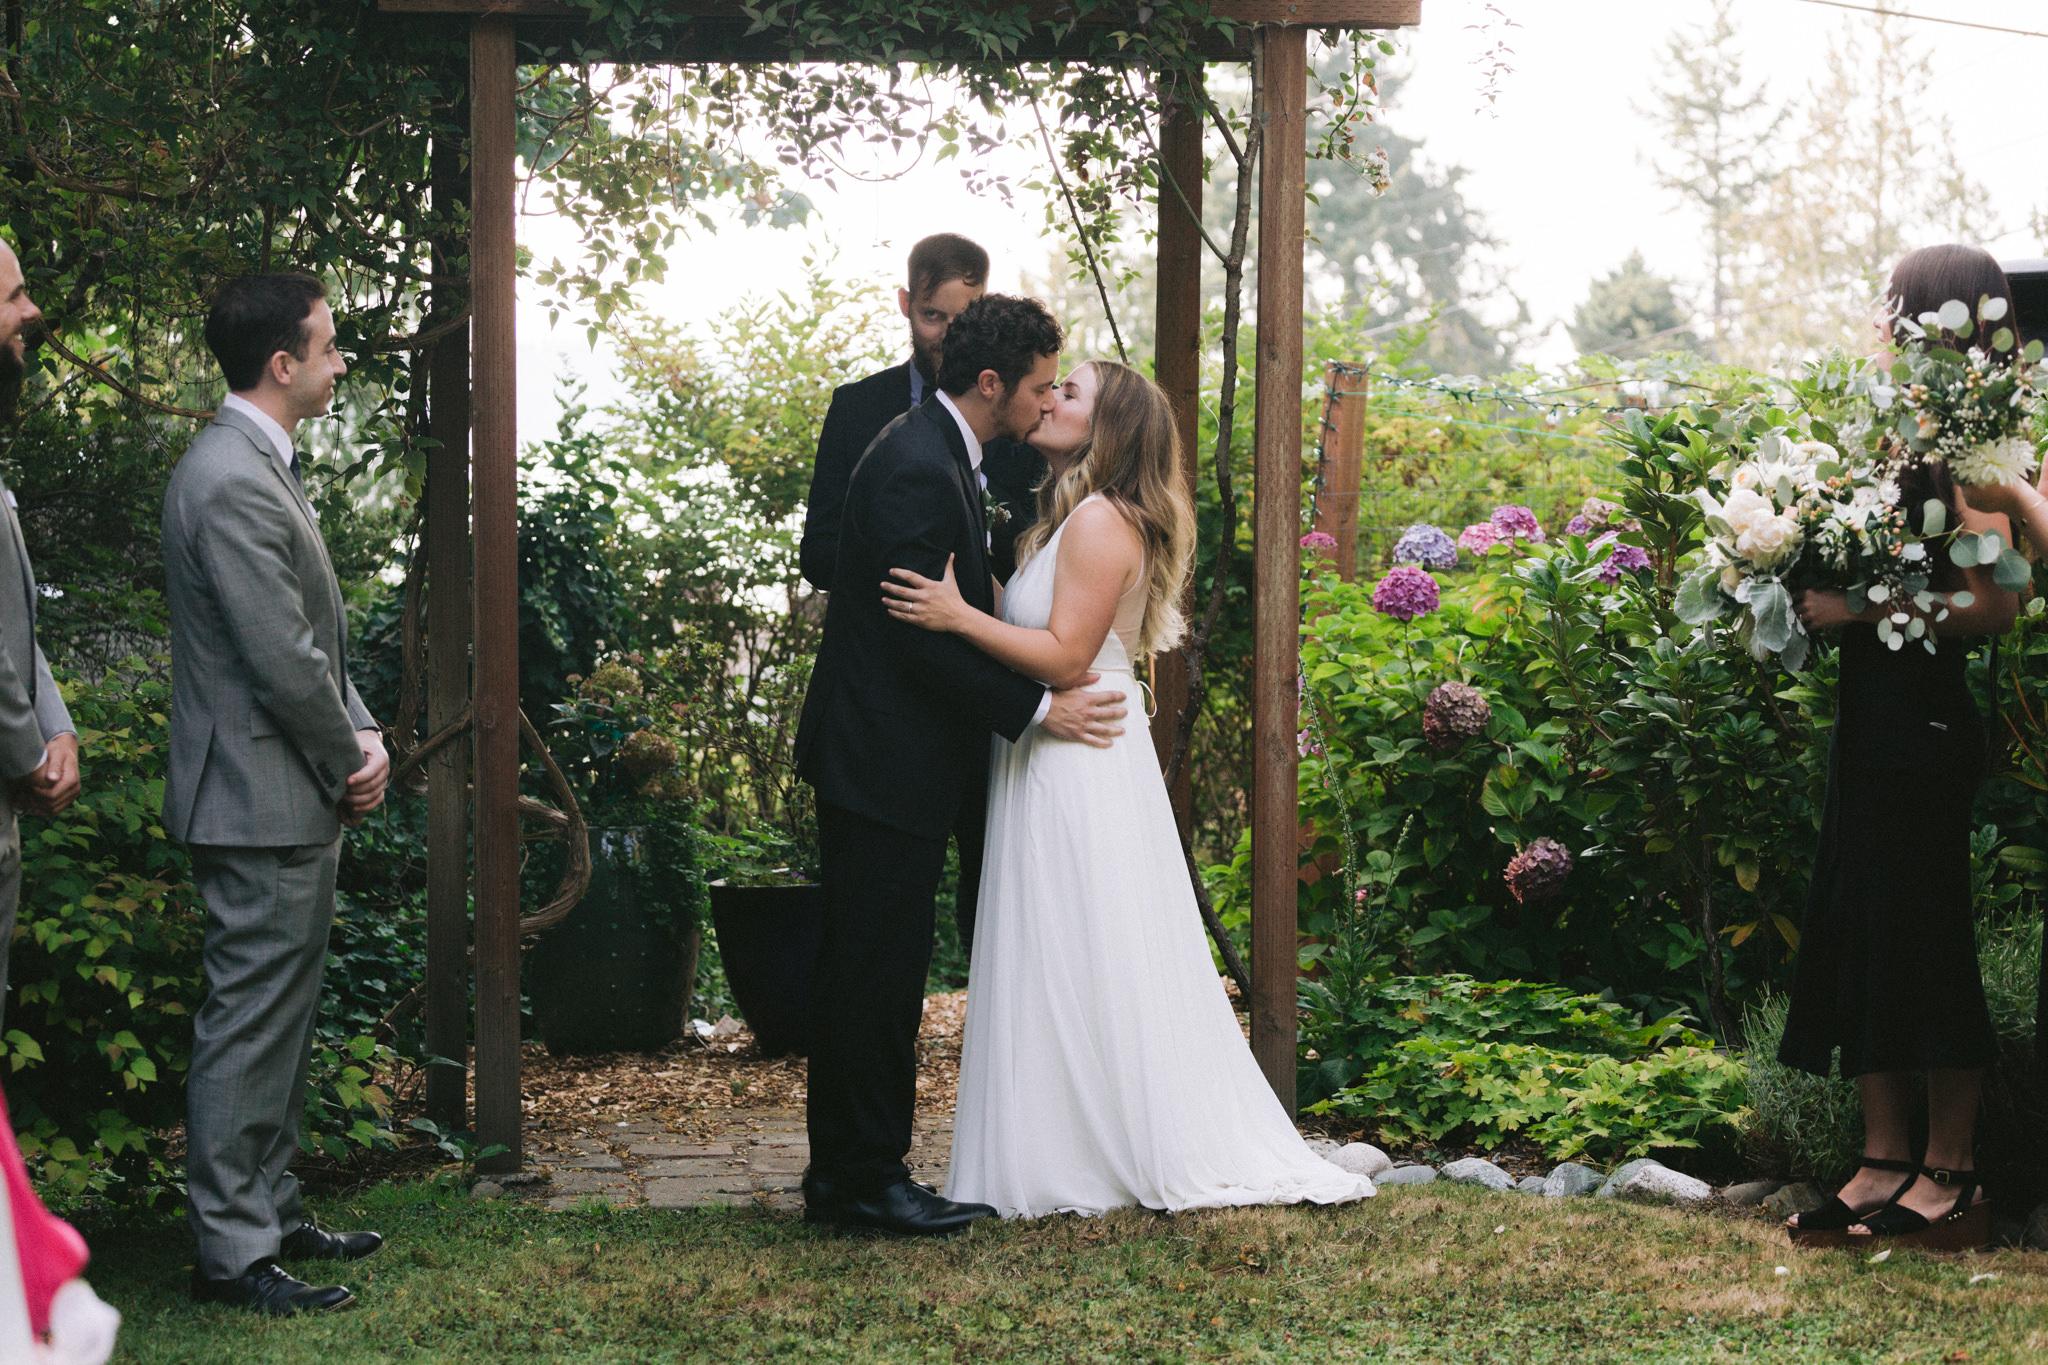 Backyard-Bainbridge-Island-Wedding-Alycia-Lovell-Photography-116.JPG